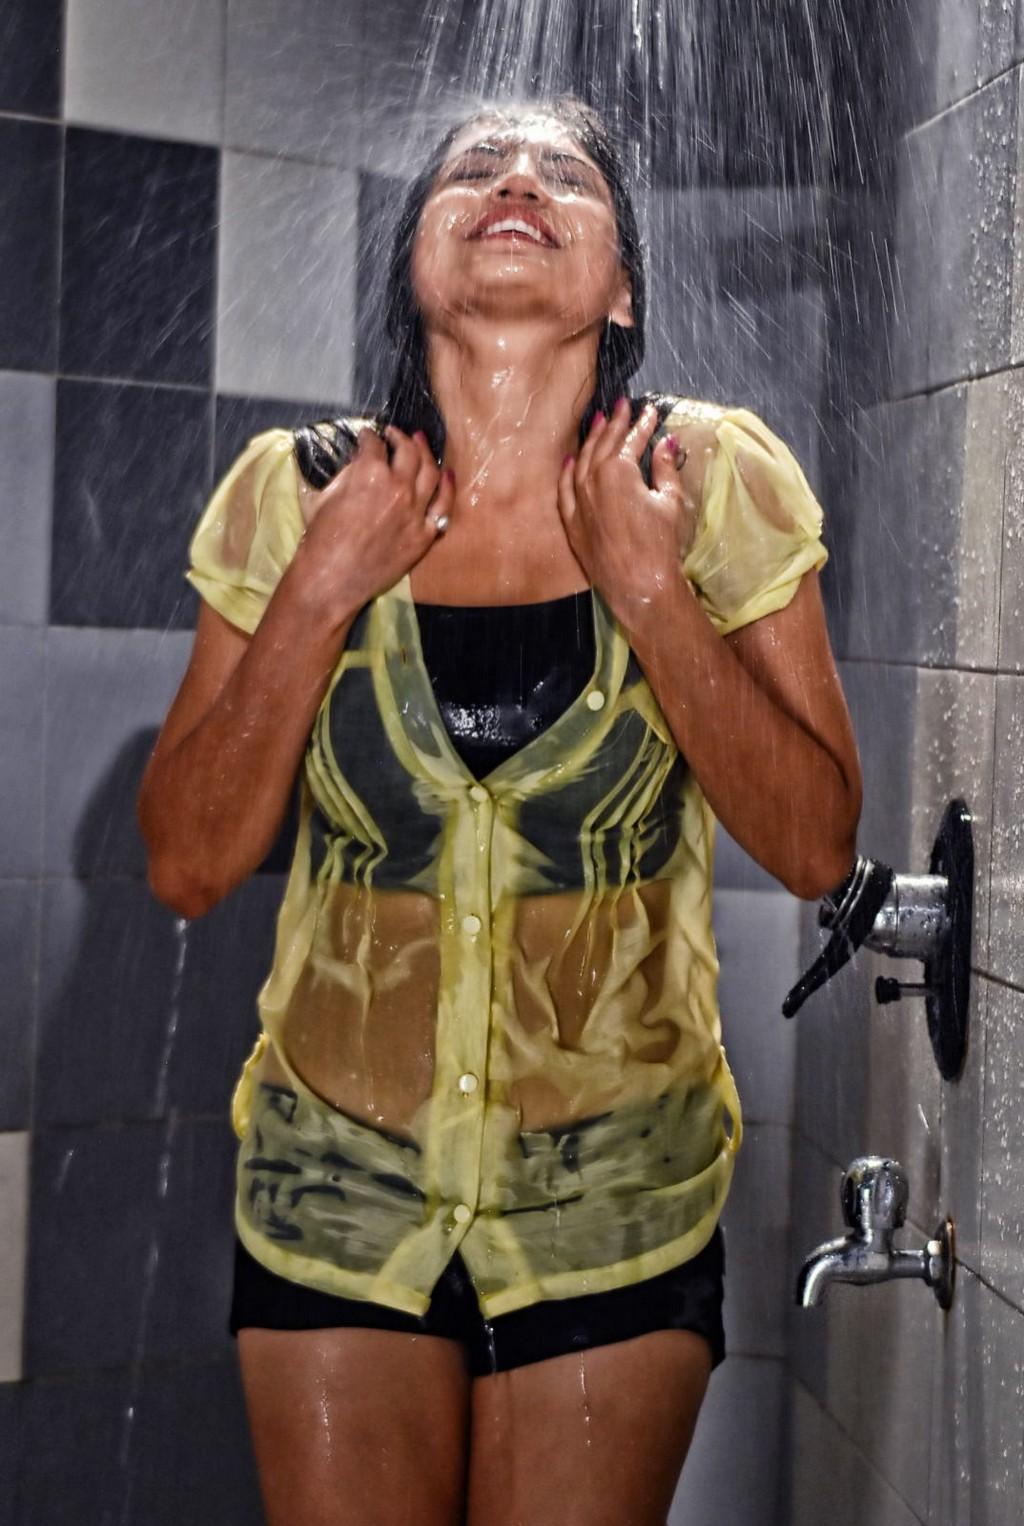 wet females: